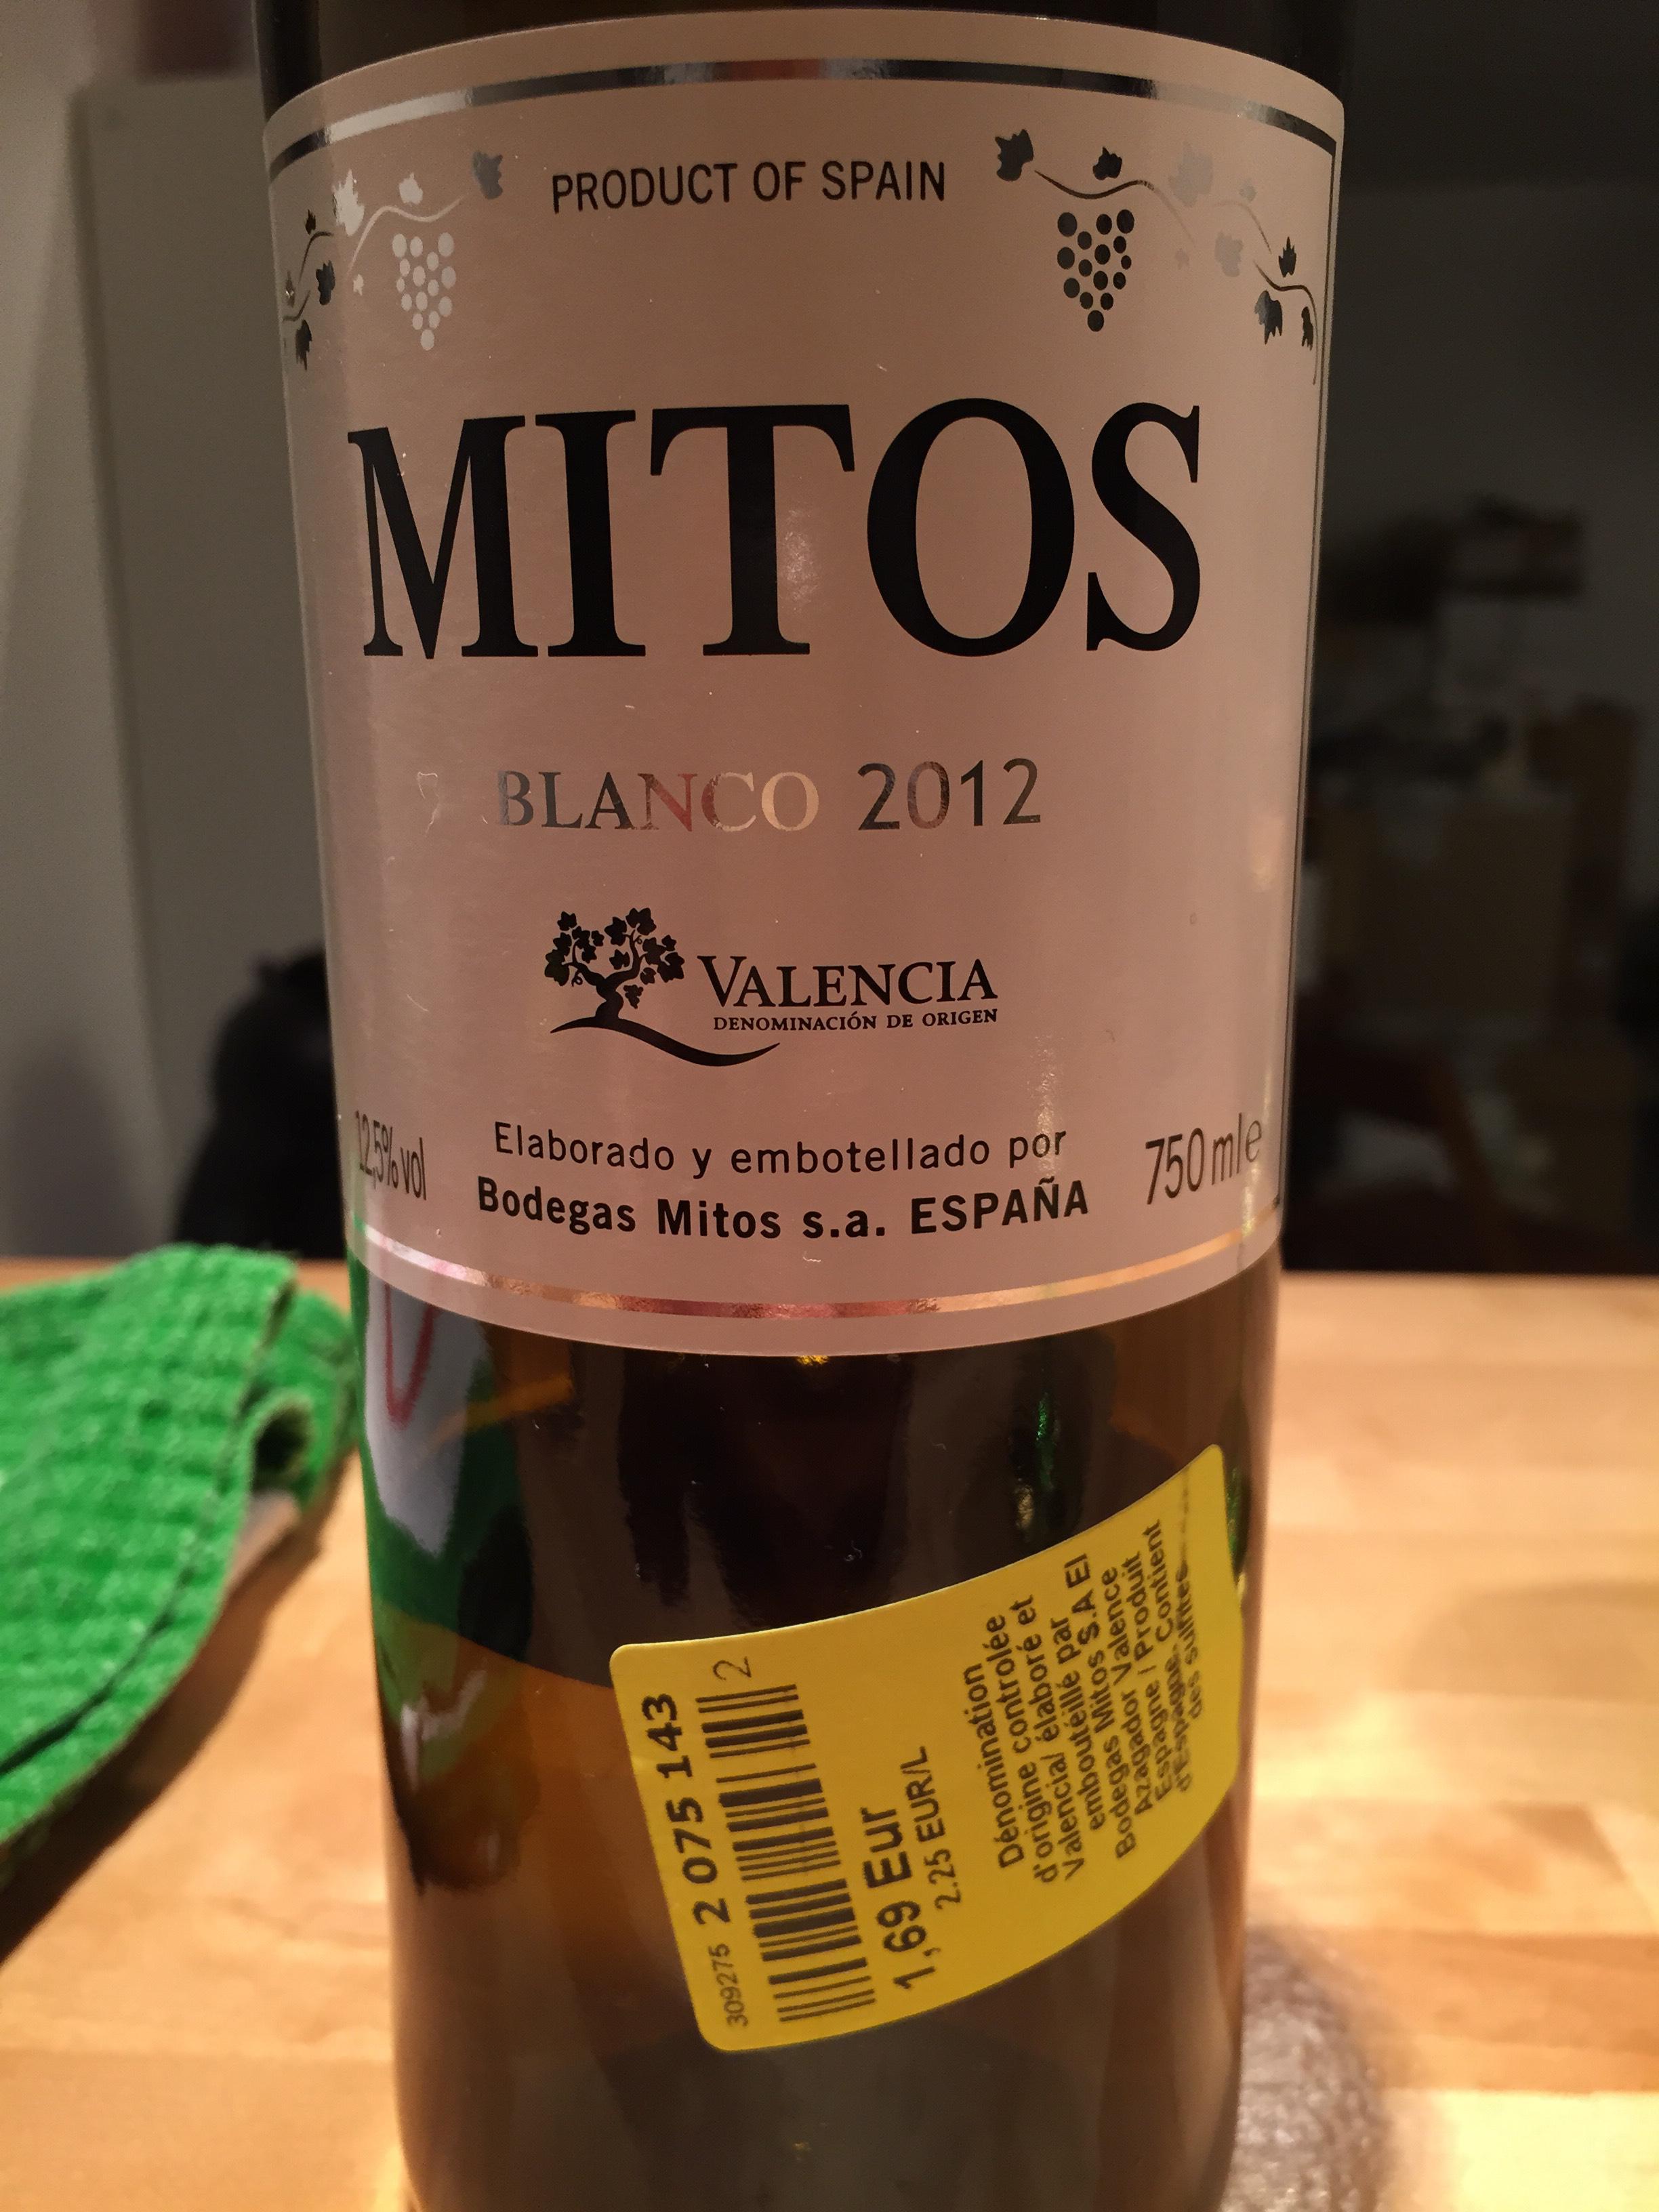 Bouteille de Vin Blanc Mitos 2012 - 750ml